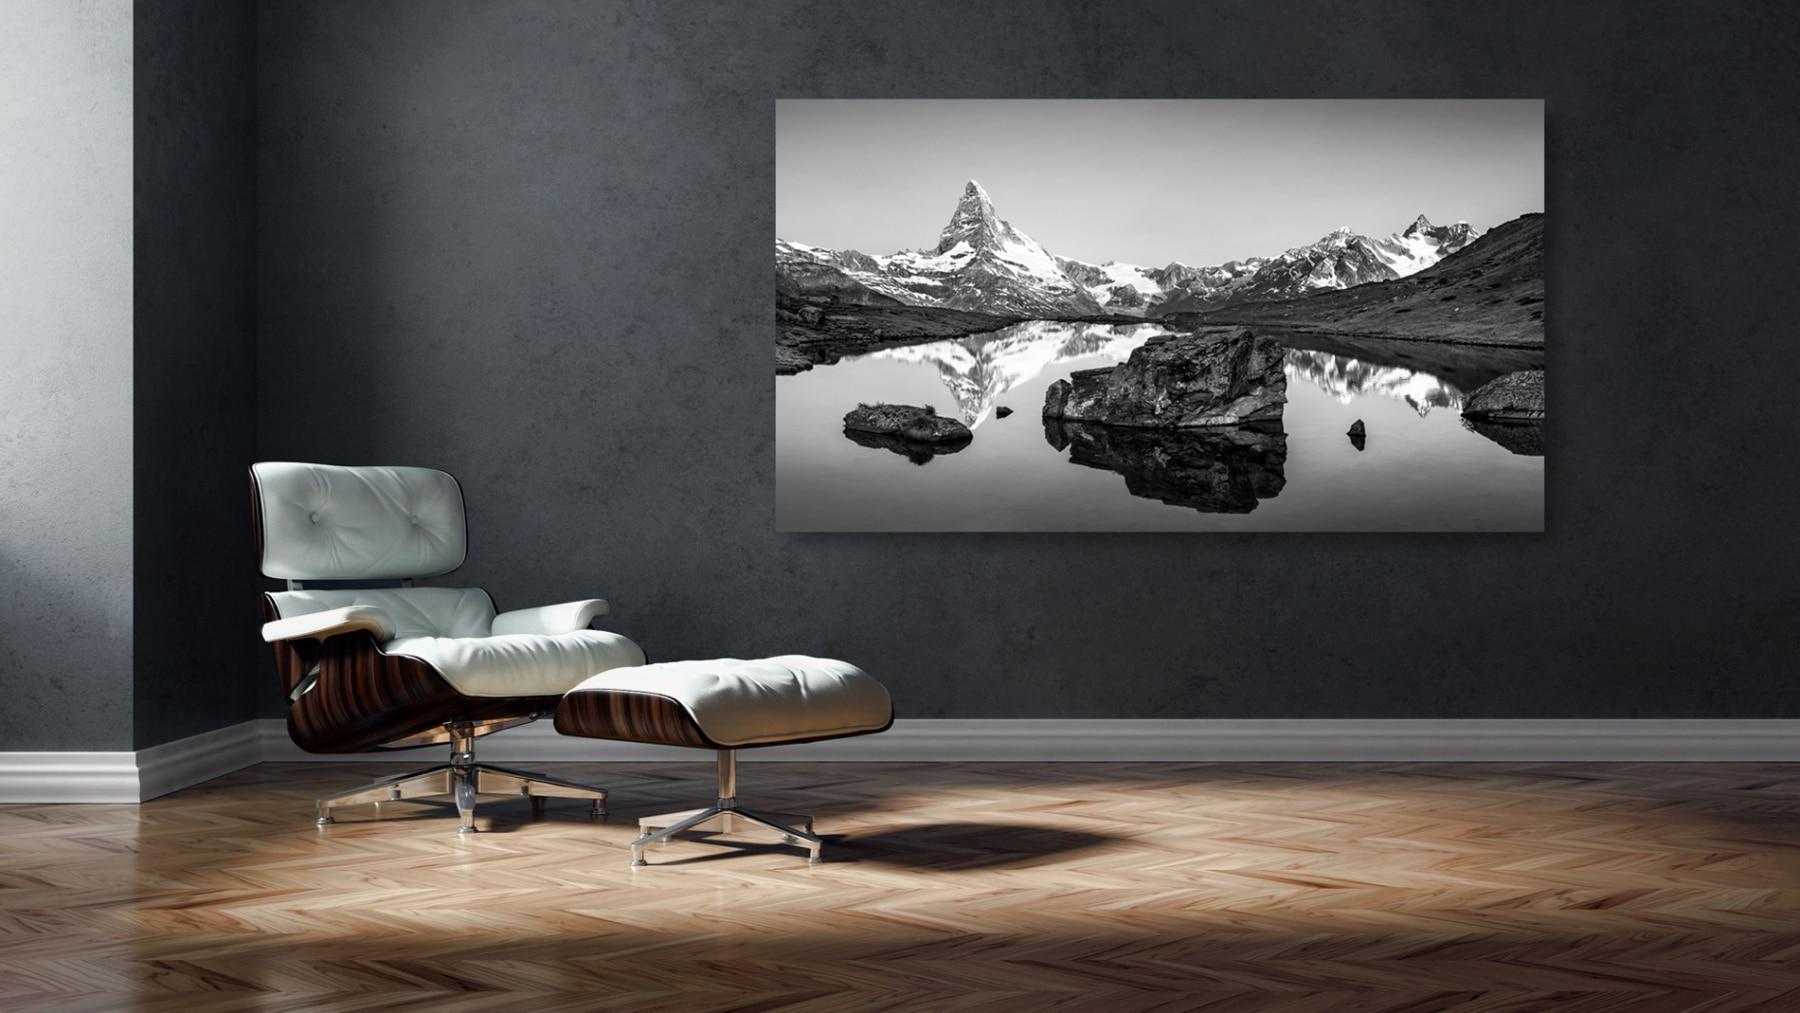 Schweiz, Zermatt, Matterhorn, Stellisee, Herbst